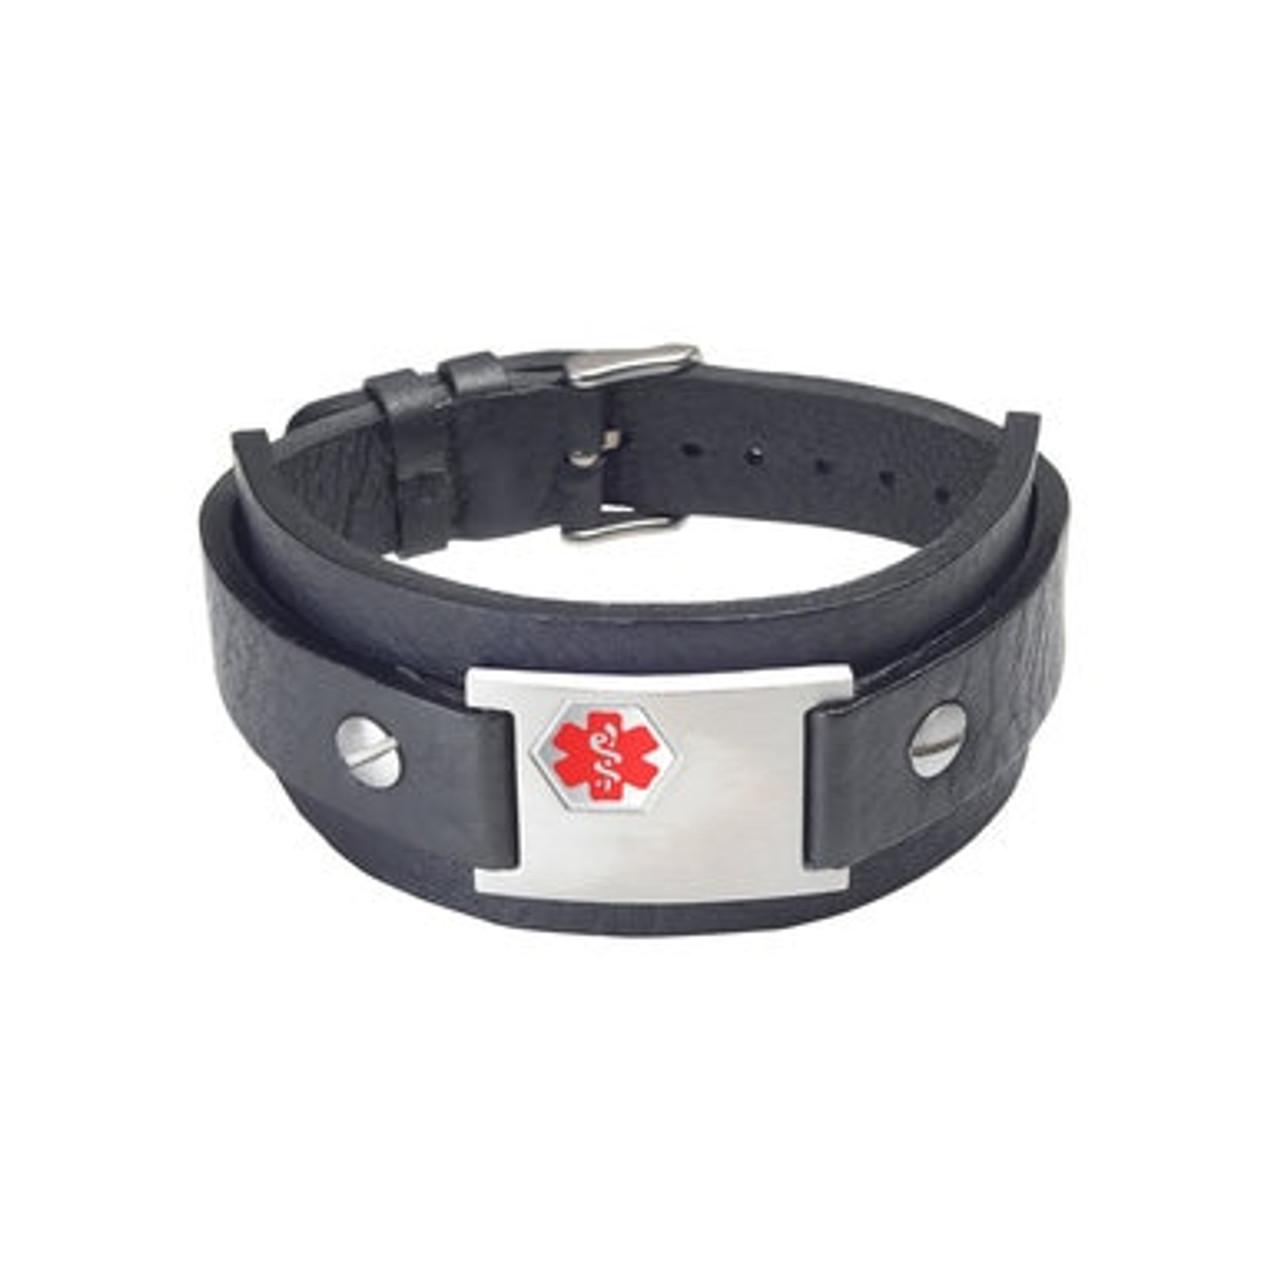 Adjustable Medical Alert Bracelet with Free Engraving Divoti Pre-Engraved Leather Medical Bracelet with Black Genuine Leather fits up to 8.5